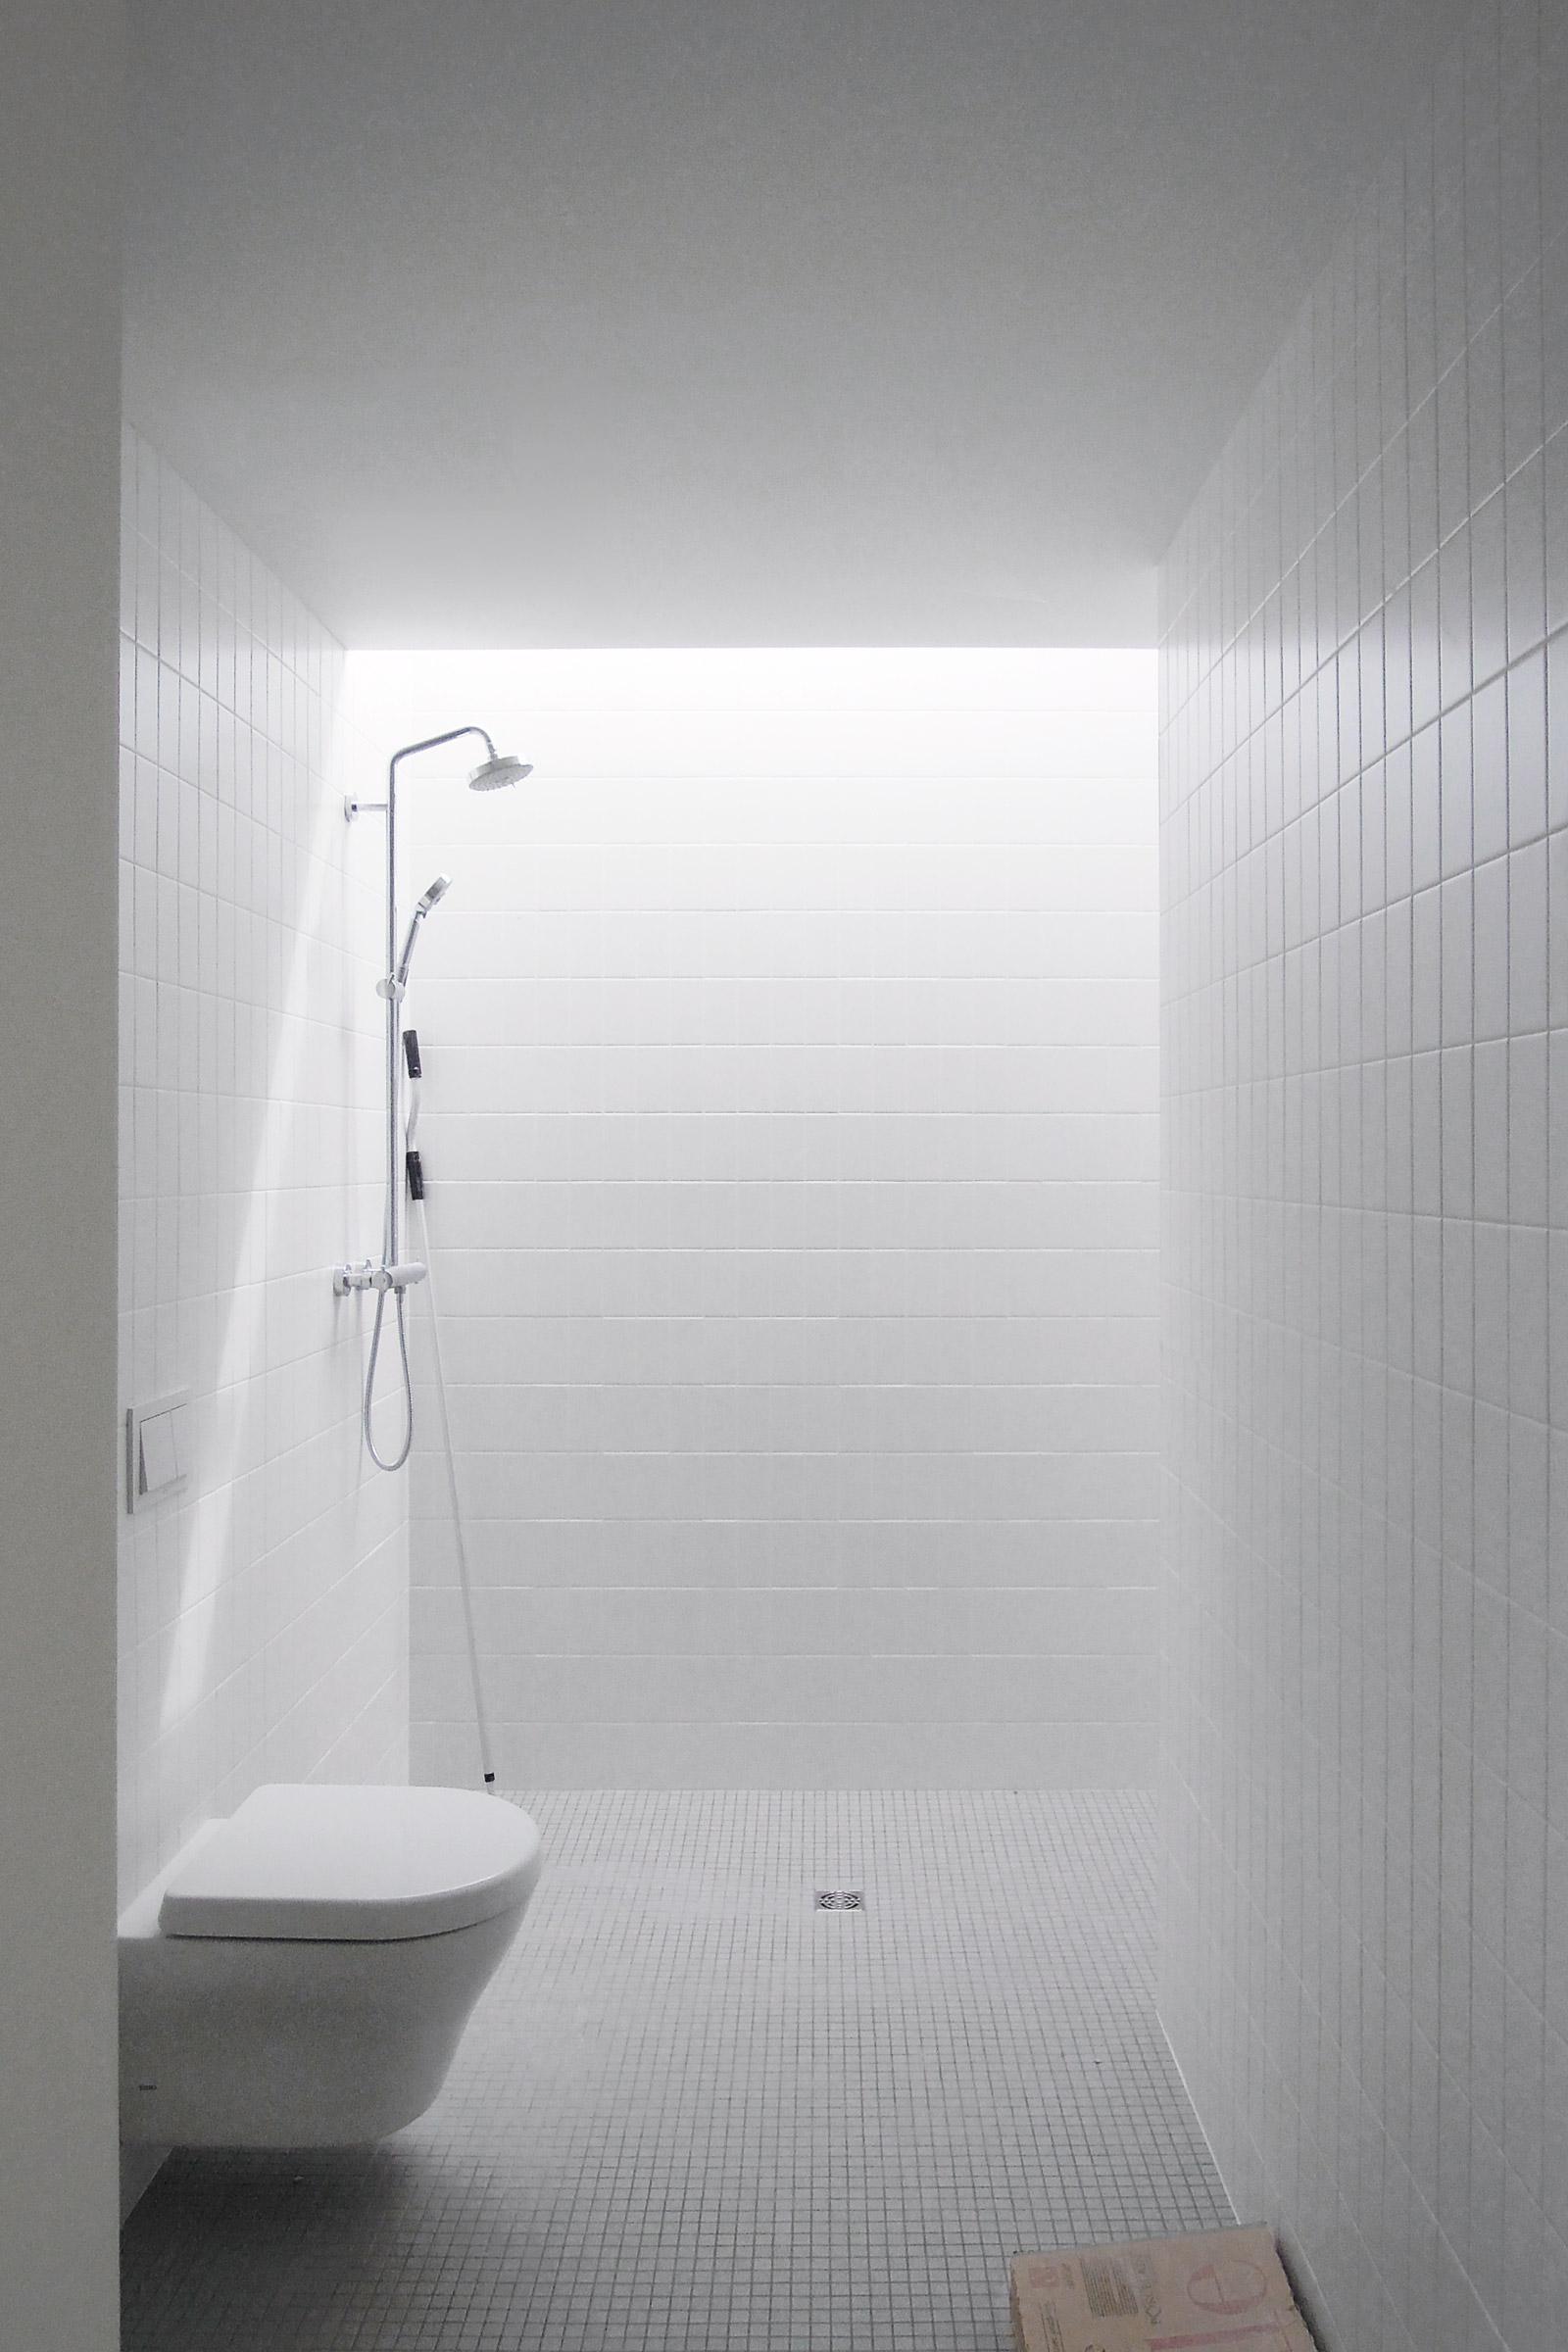 Shelton House. Bathroom with skylit shower area